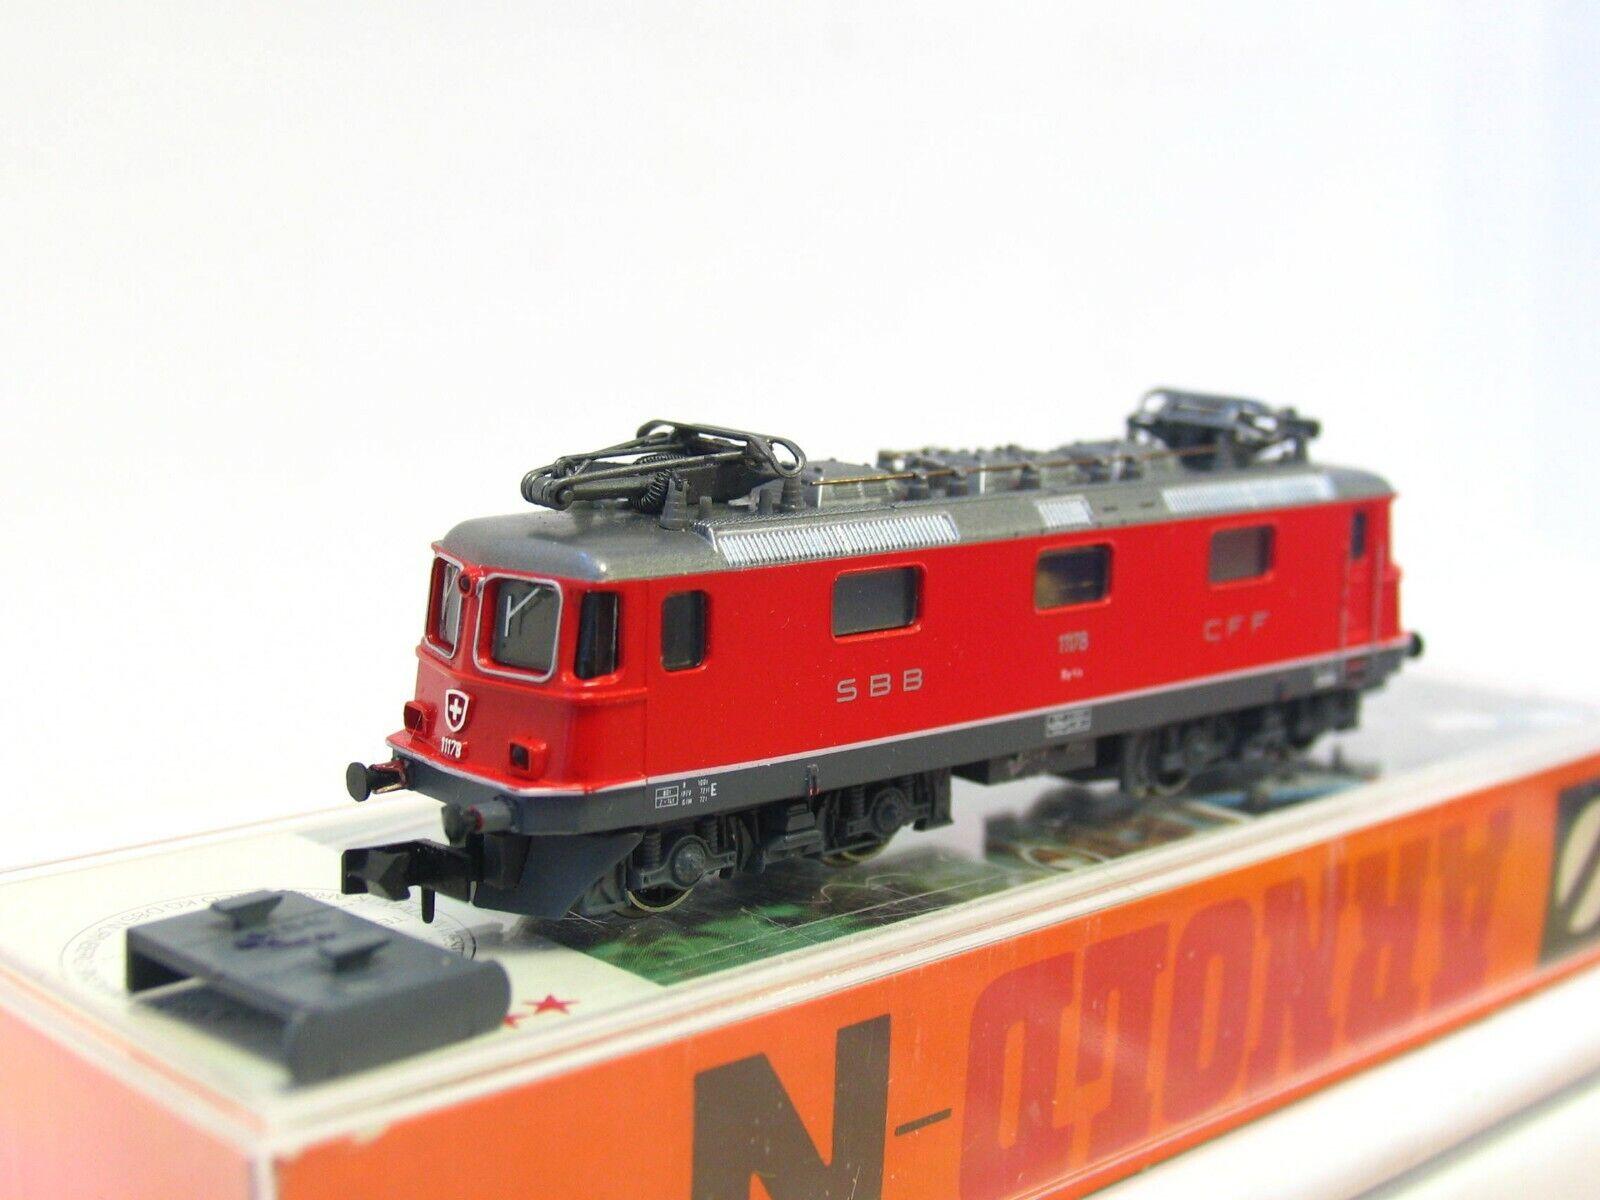 Arnold N 2415 E-Lok Re 4 4 11178 SBB CFF FFS OVP (RB6737)